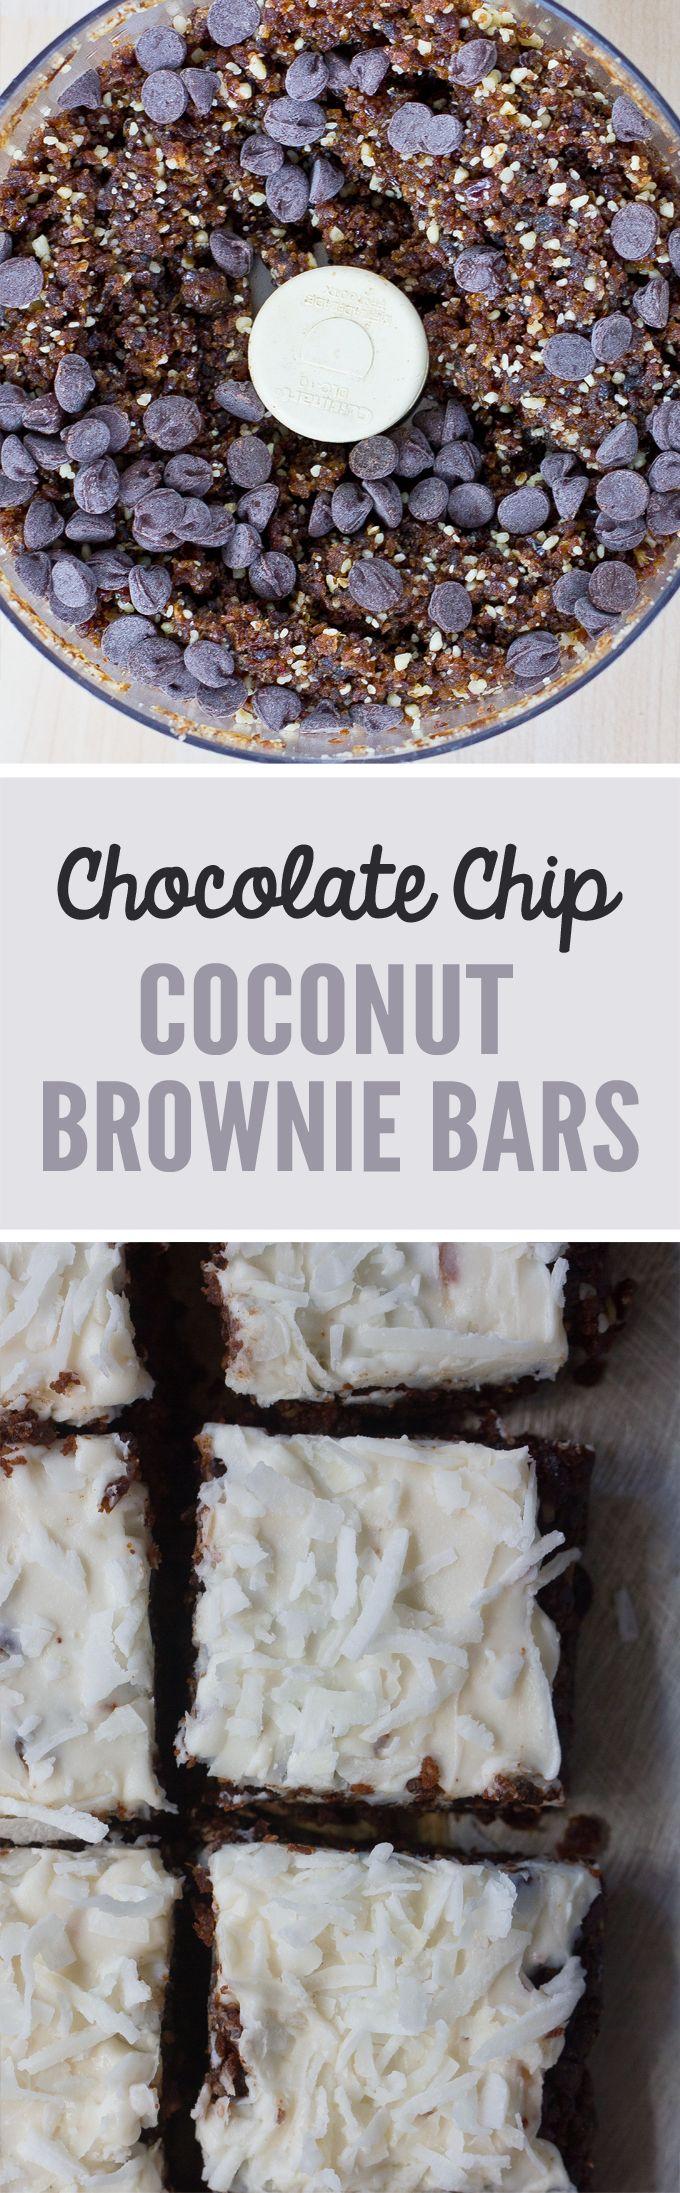 Coconut Brownie Bars - Ingredients: 6 tbsp cocoa powder, 1/2 cup shredded…  #kombuchaguru #healthydesserts Also check out: http://kombuchaguru.com